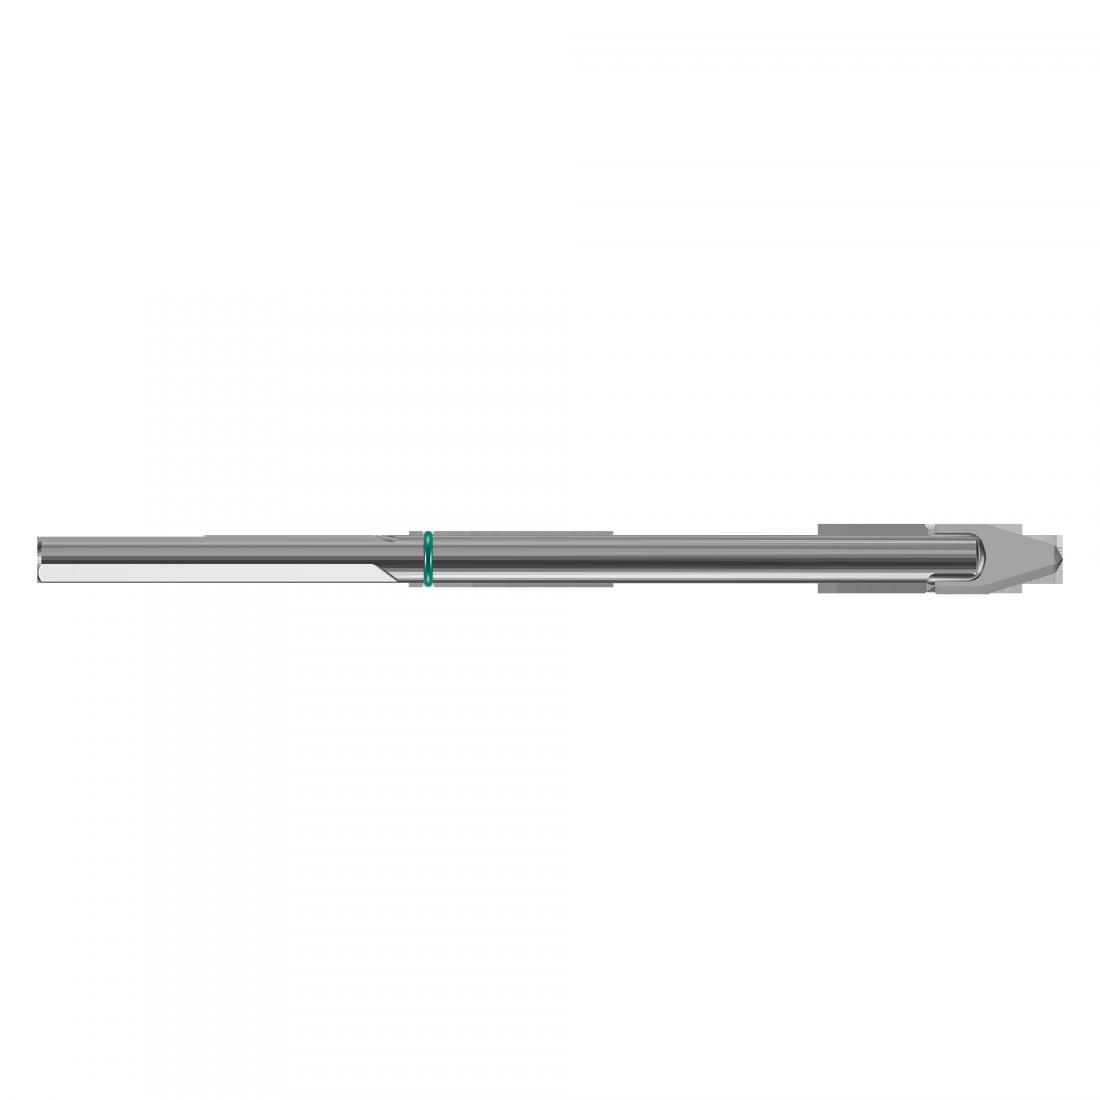 Сверло по керамограниту Heller CeraExpert 8х125мм